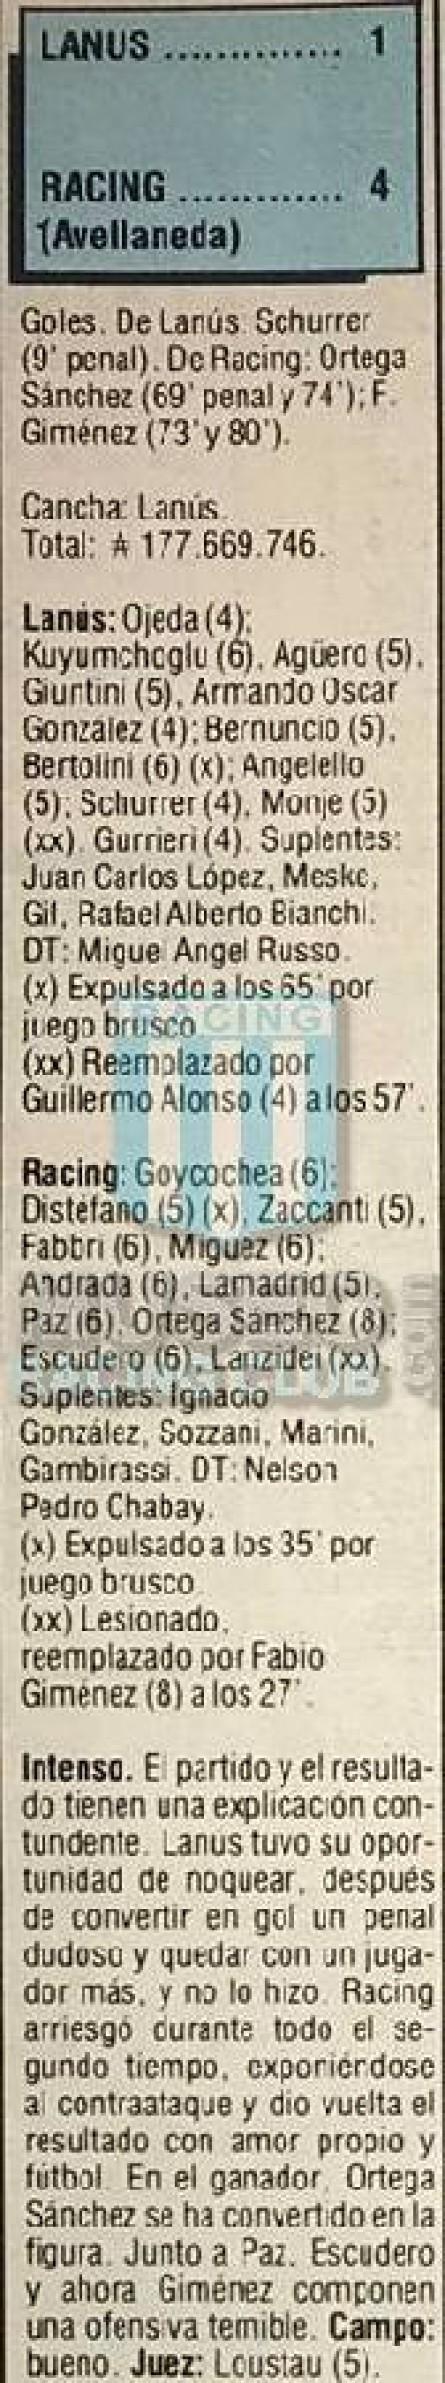 Racing_1990_GKVioleta_Reusch_Salicrem_AP90vsLanus_FICHA_ML_1_SergioGoycoechea_jugador_01